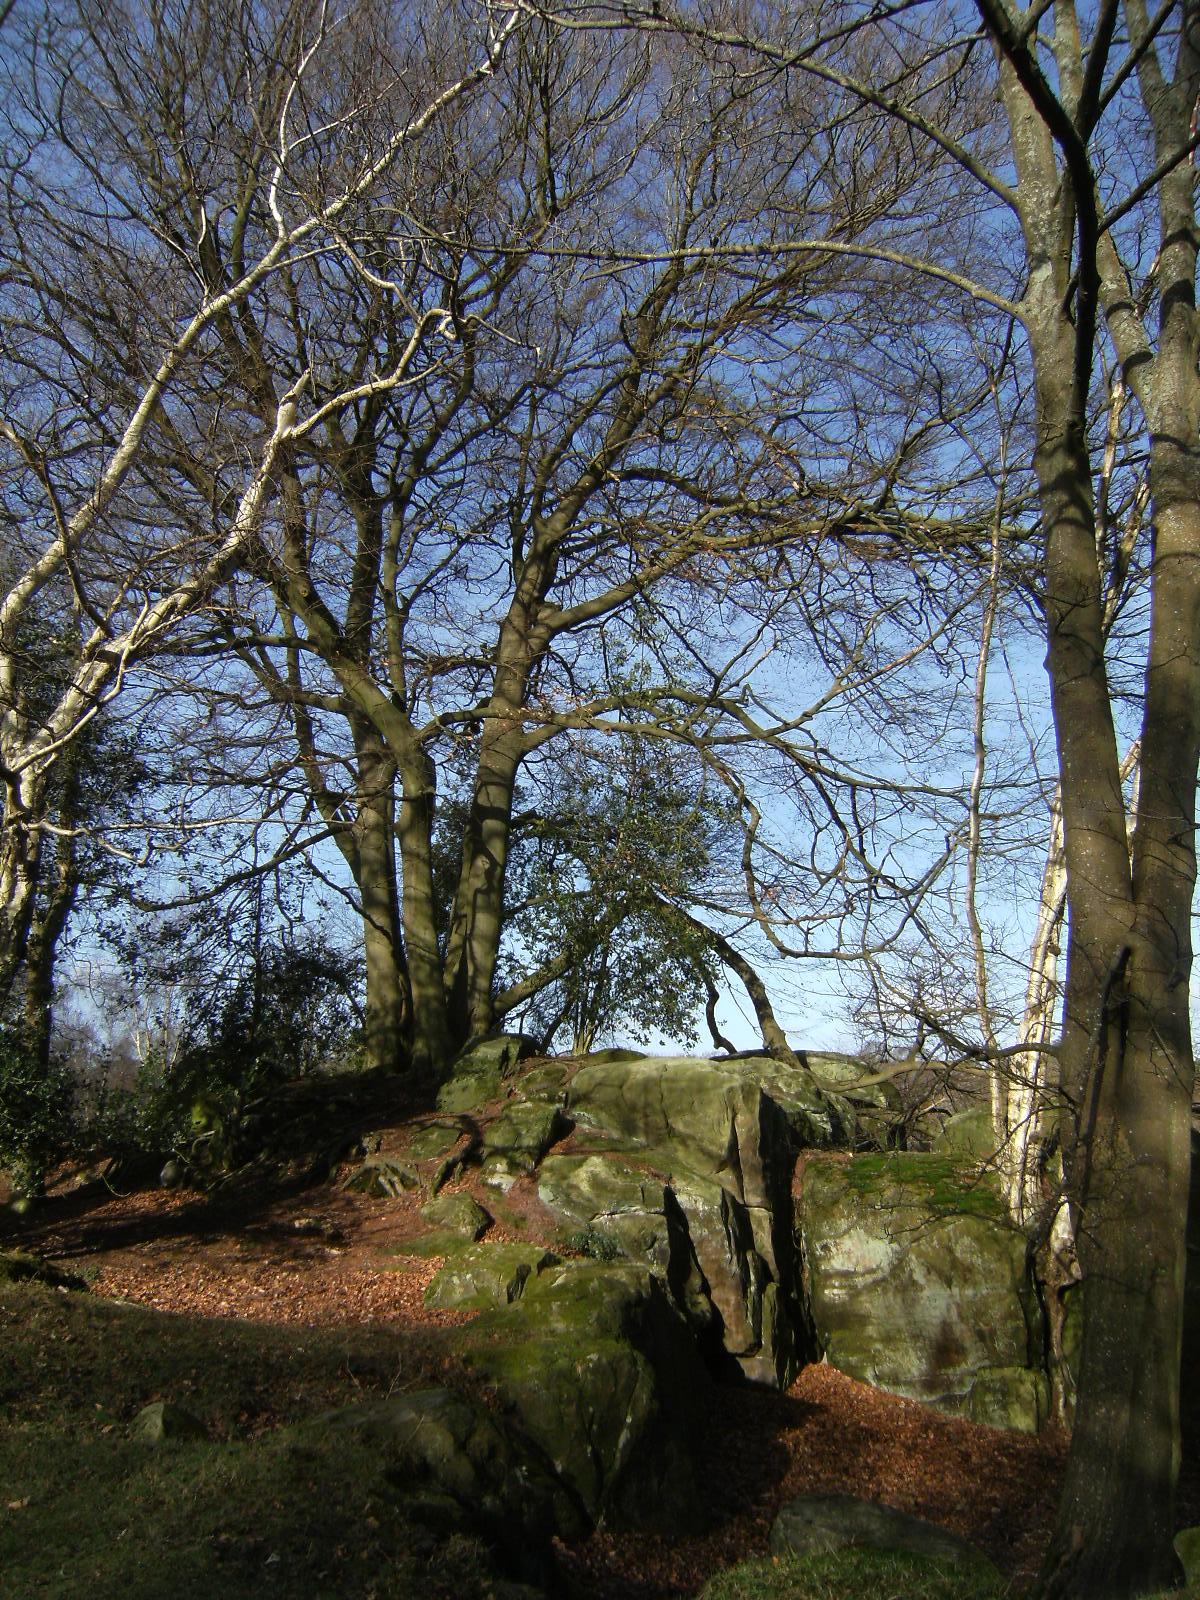 1102030052 Sandstone outcrop on the High Weald Landscape Trail